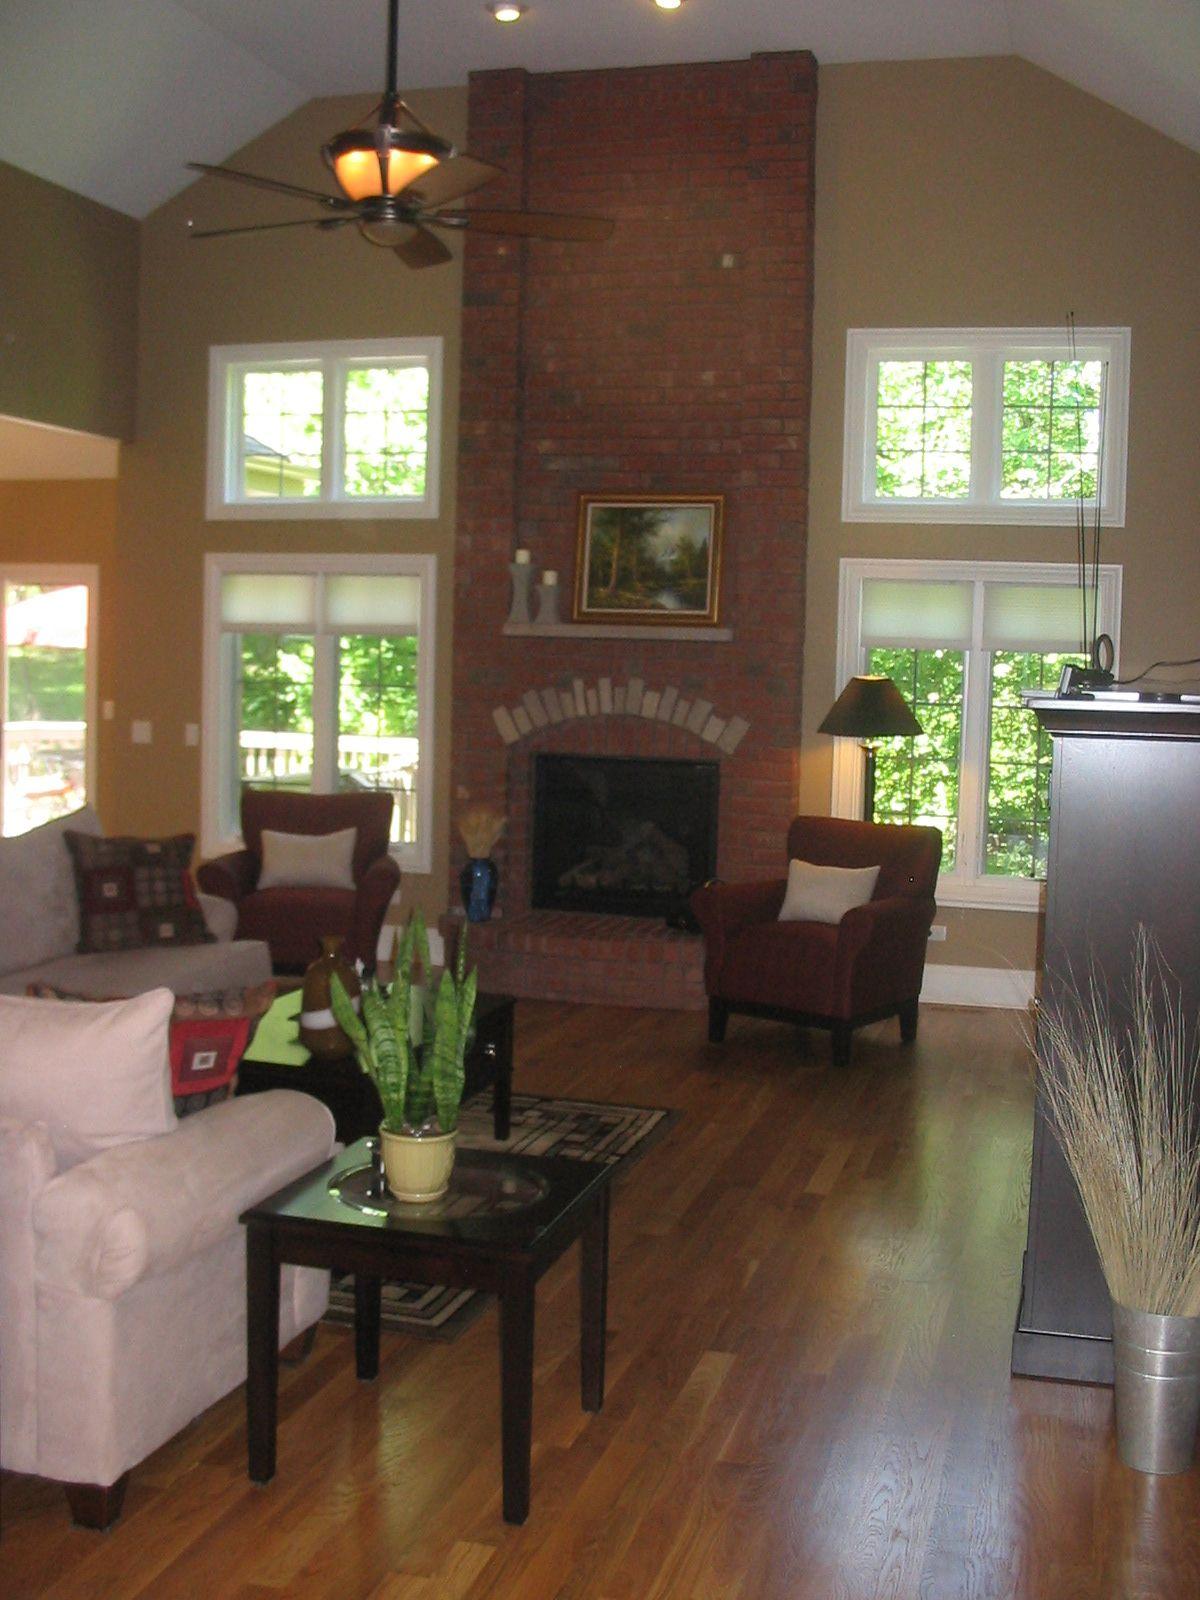 Interior Design Fireplace Living Room: Open Living Room, Brick Fireplace